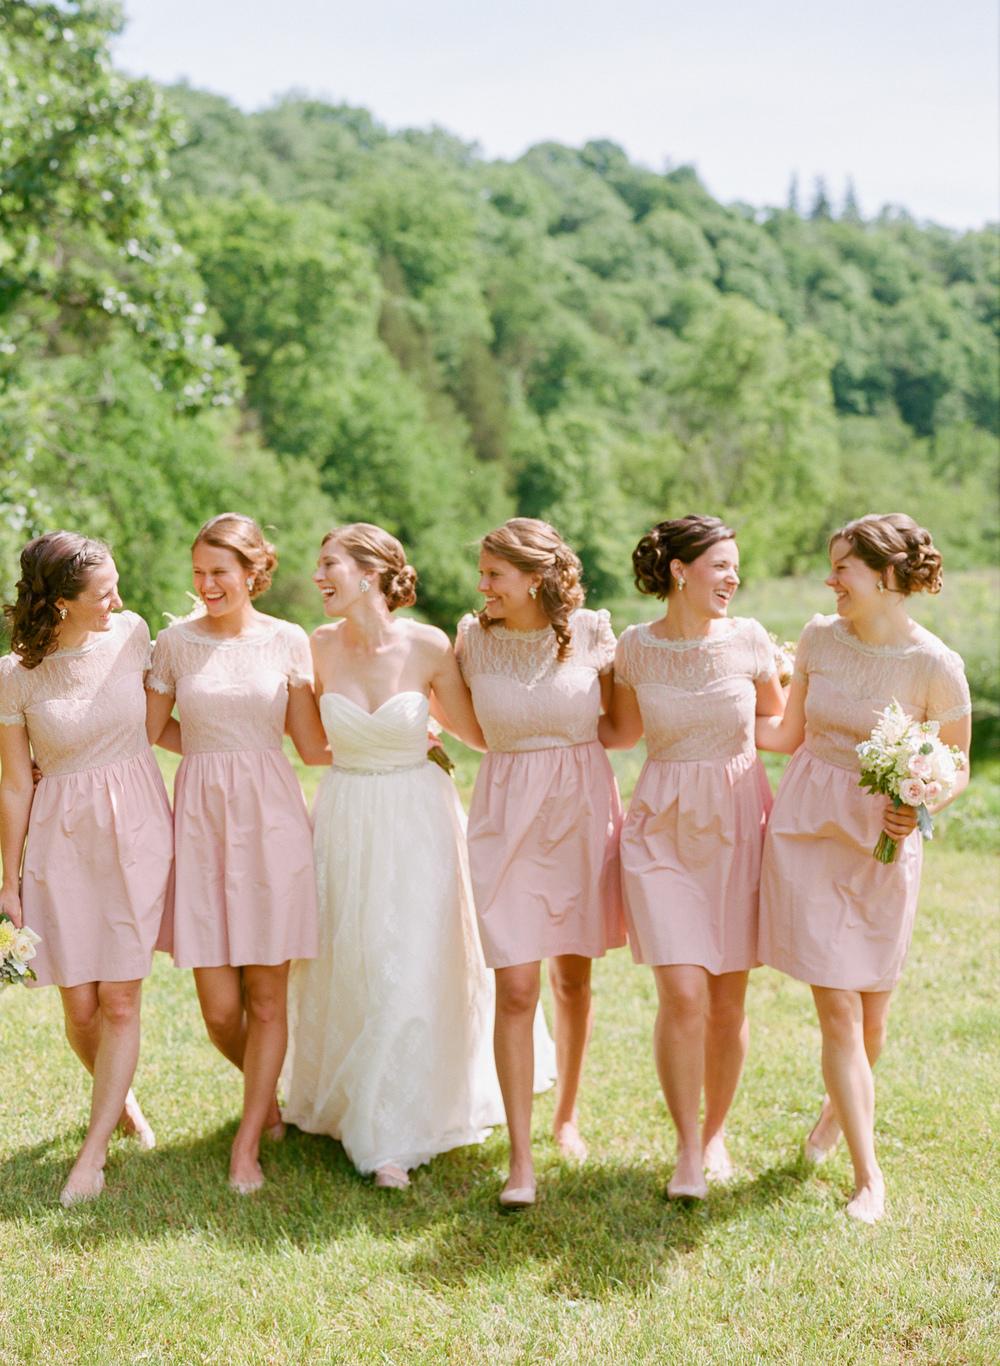 roth_wedding_high_res-251.jpg